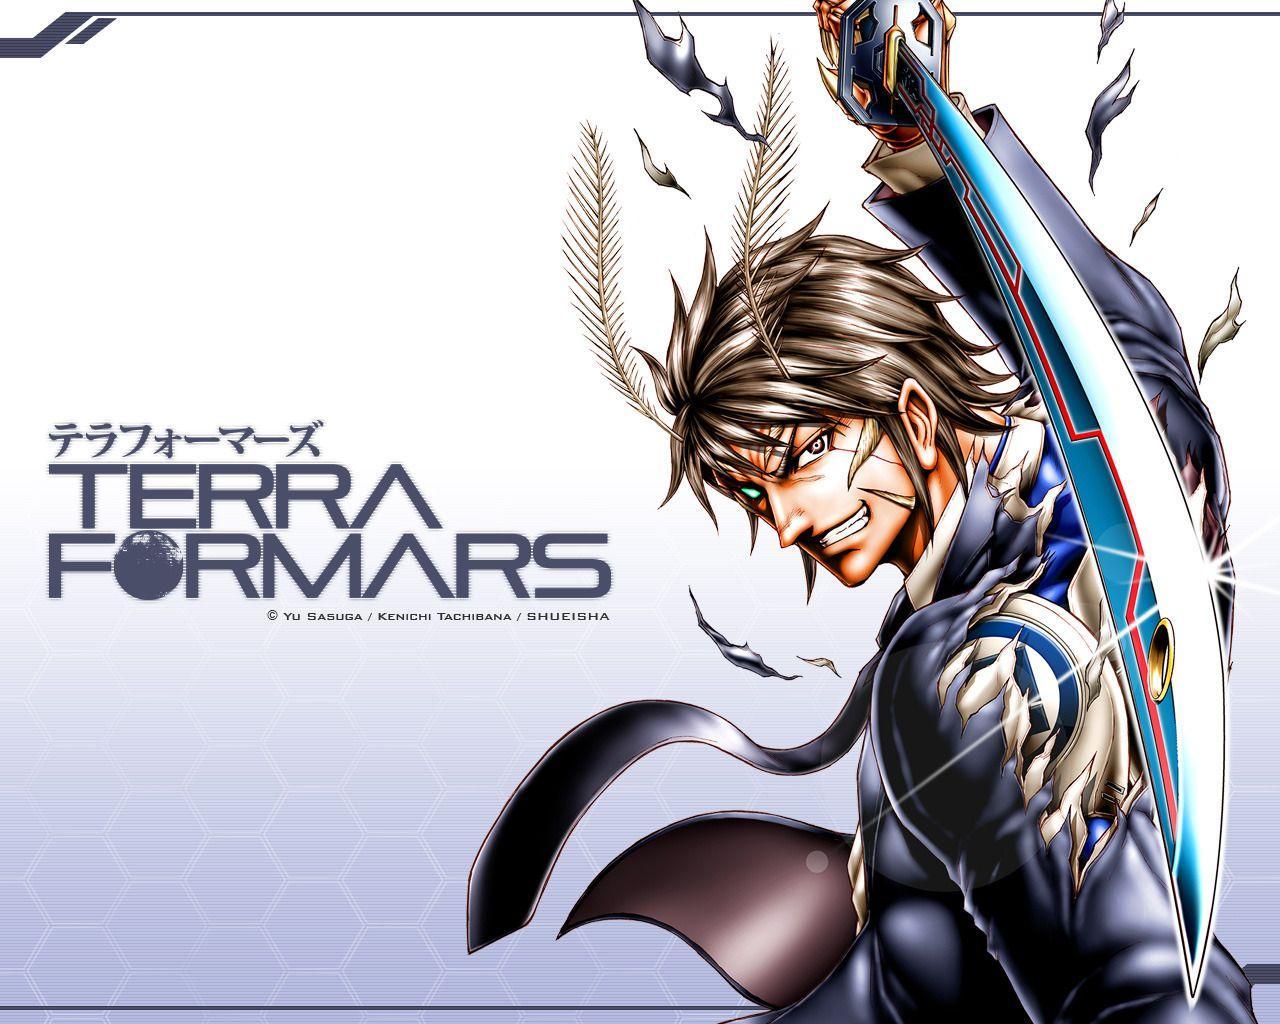 Terra Formars Wallpapers Wallpaper Cave